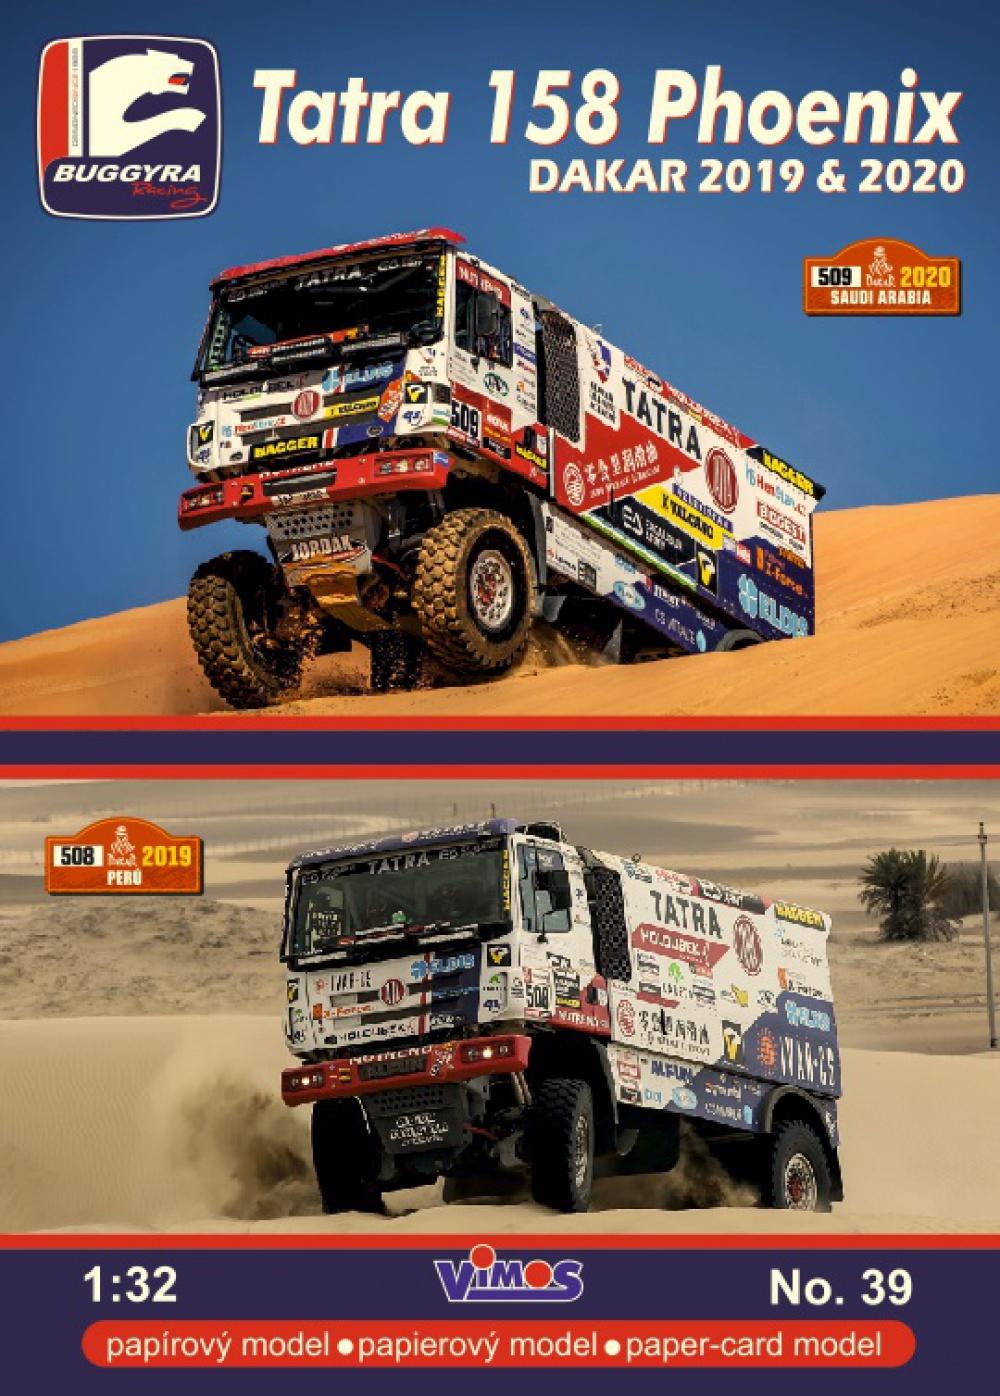 Tatra 158 Phoenix Buggyra - Dakar 1019-2020